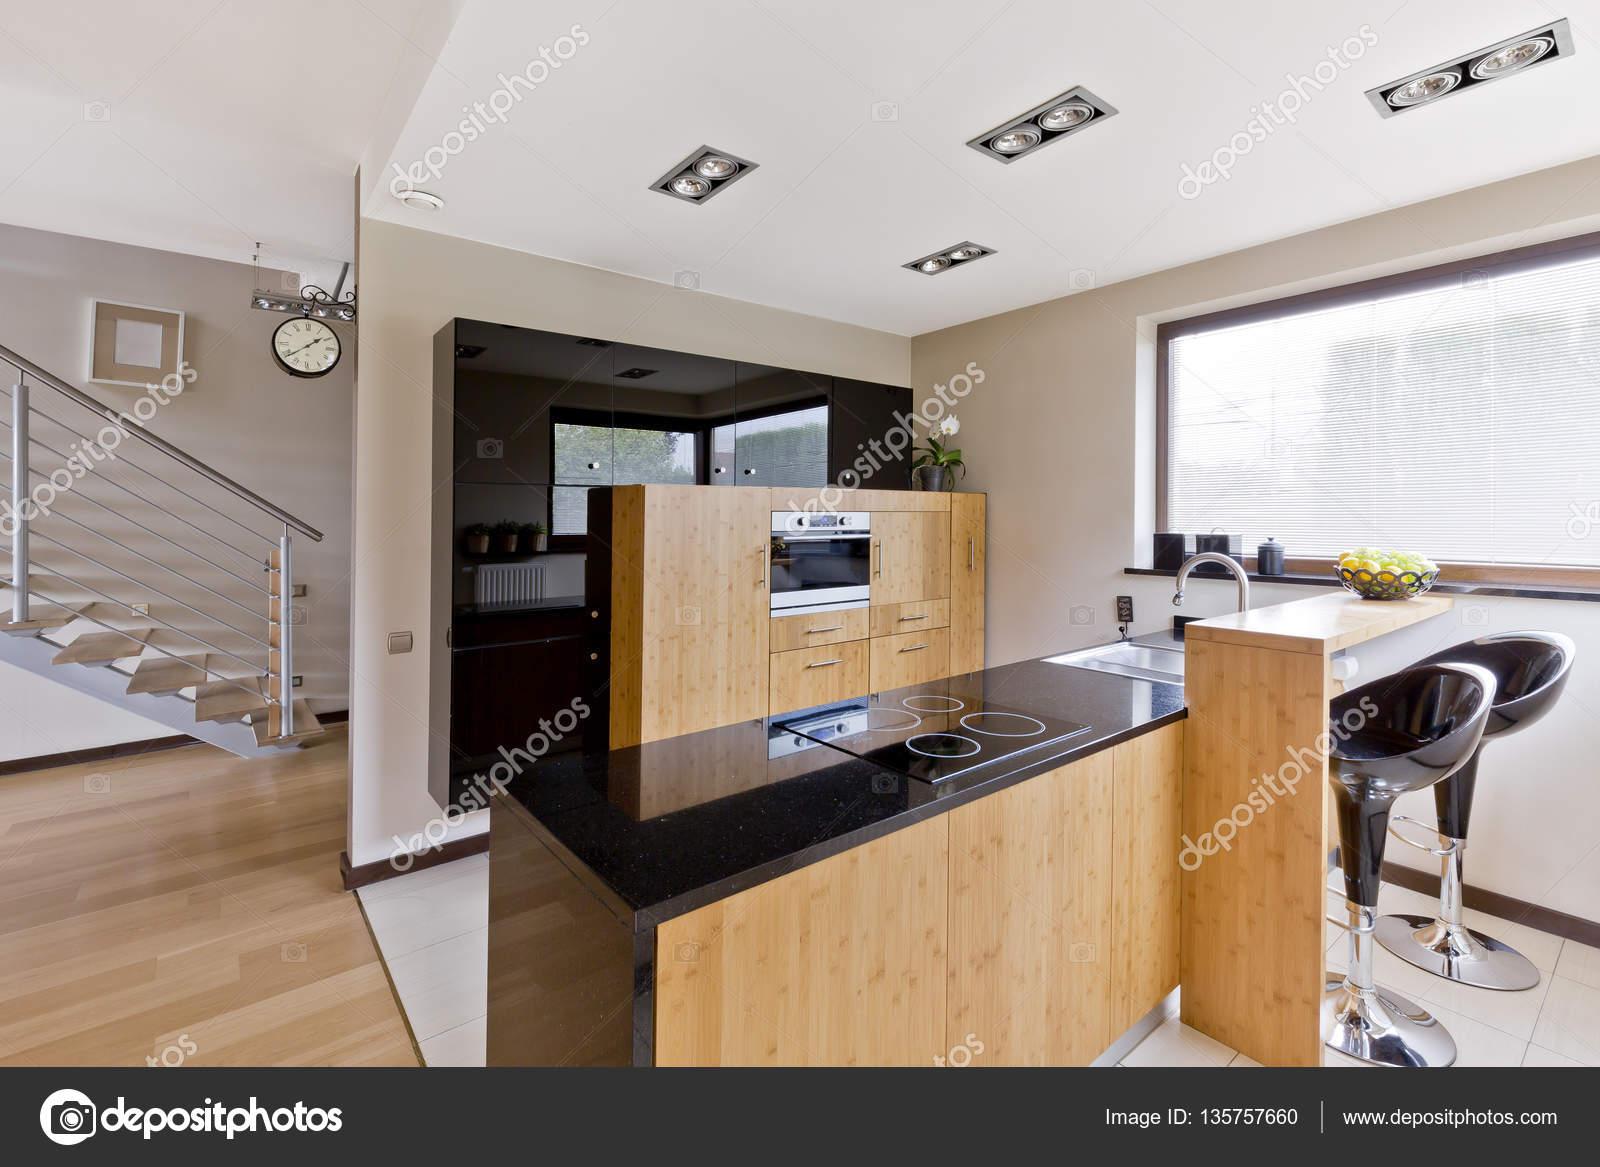 Cucina moderna con sgabelli da bar u2014 foto stock © photographee.eu